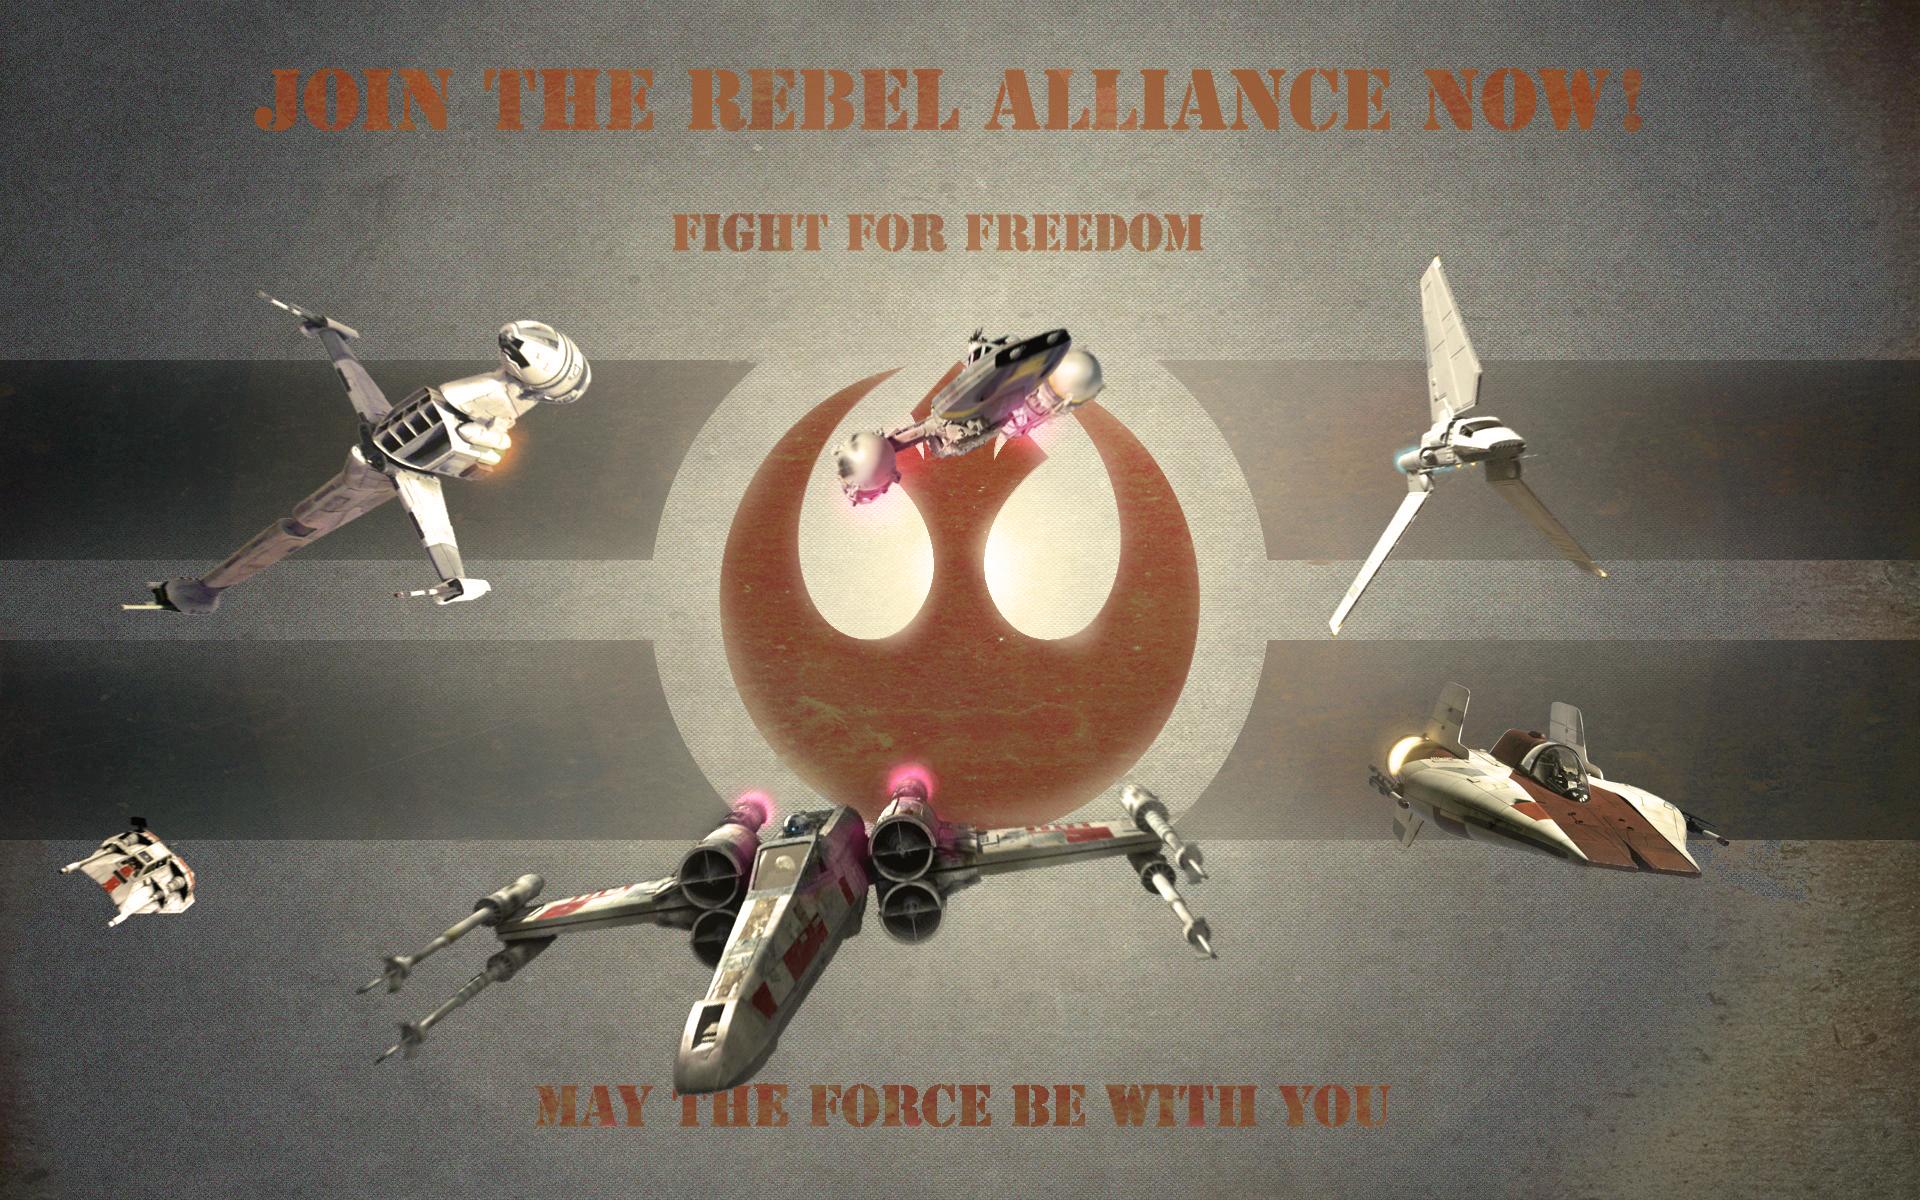 rebel alliance propaganda by 1darthvader on deviantart